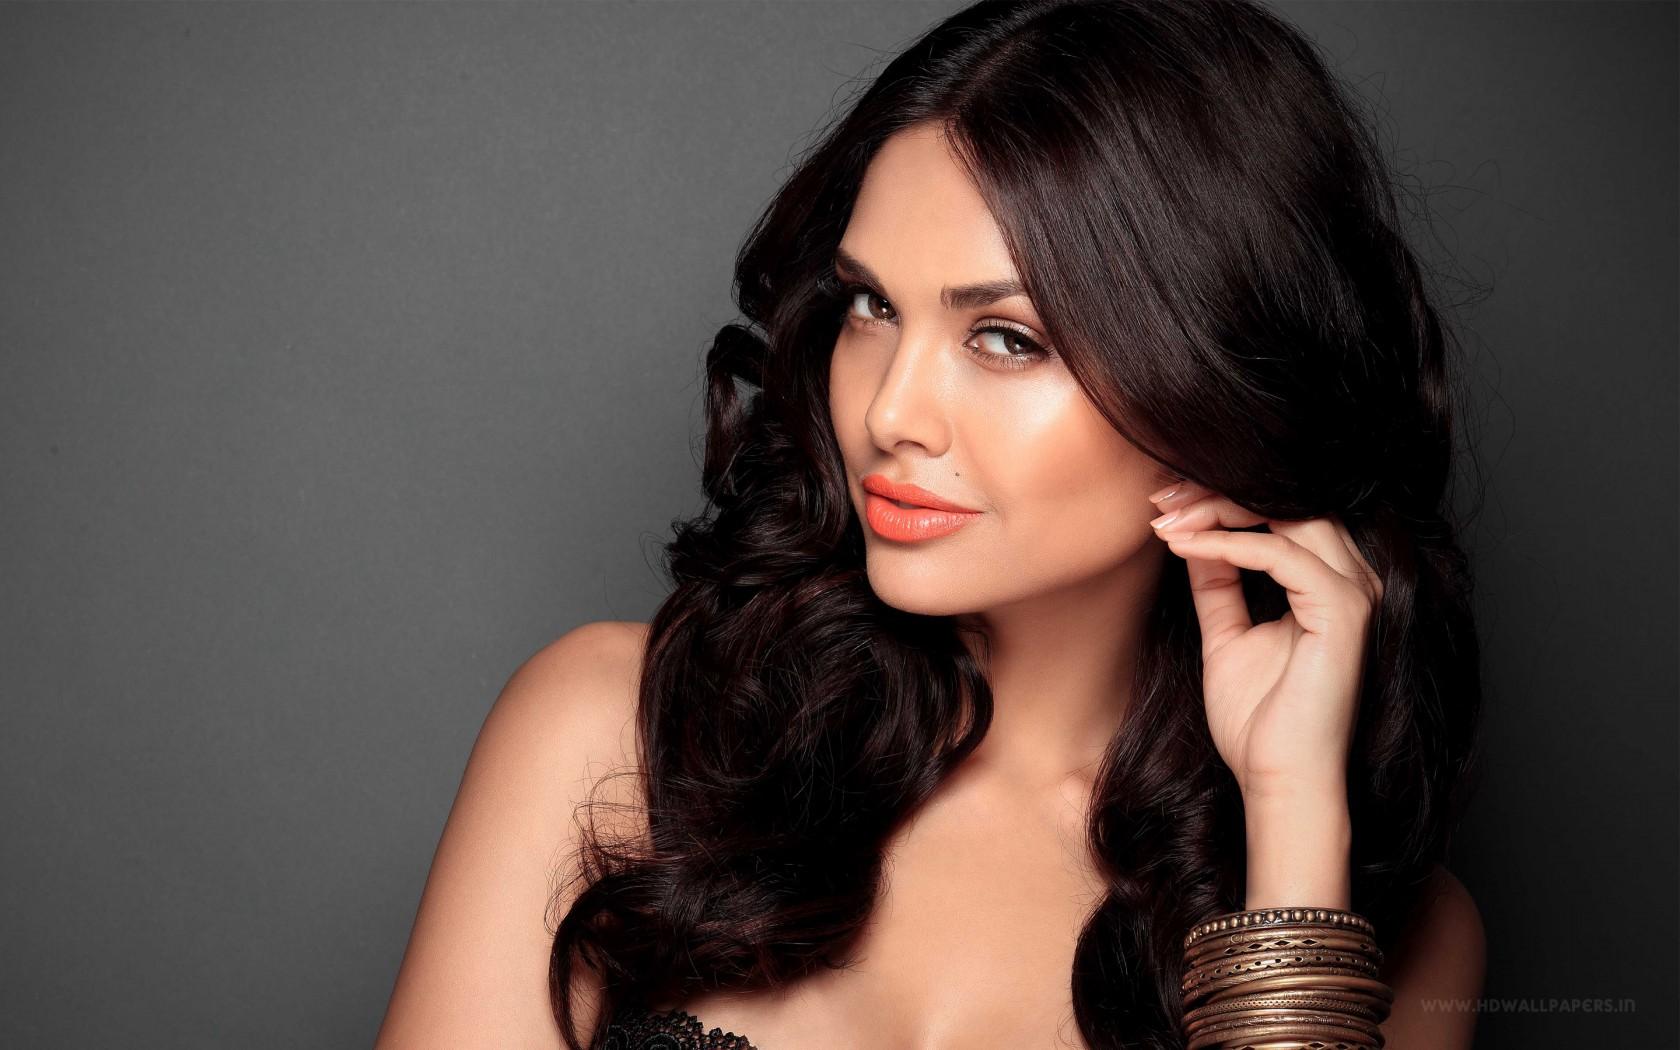 Madhurima Hd Wallpaper Bollywood Heroine Esha Gupta Wallpapers Hd Wallpapers